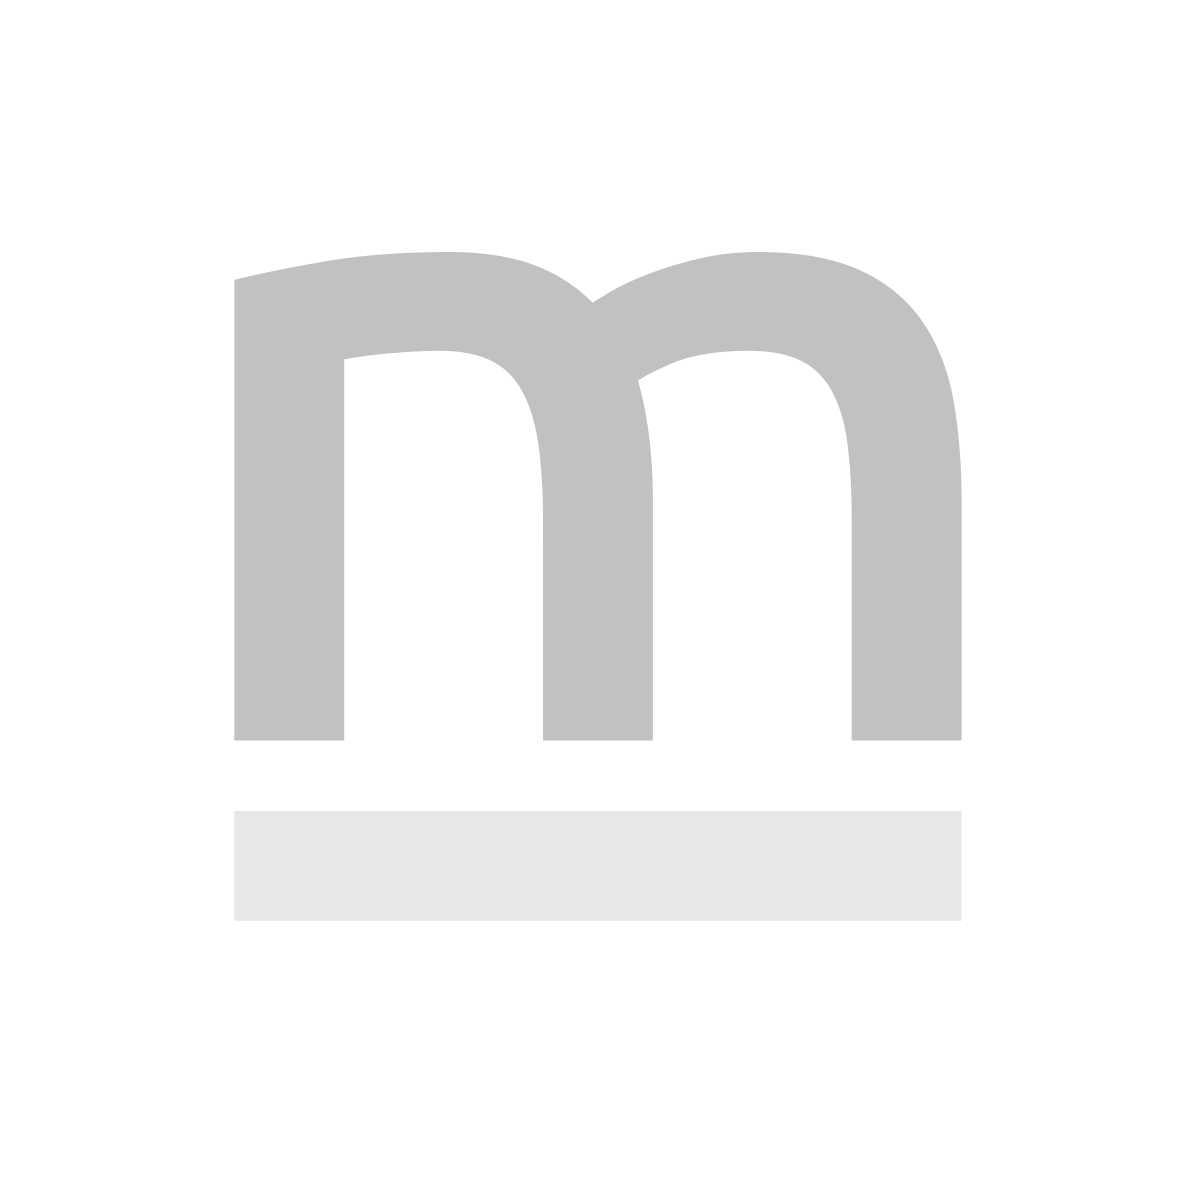 Parawan 5-częściowy - Mount Fitz Roy, Patagonia, Argentina II [Room Dividers]